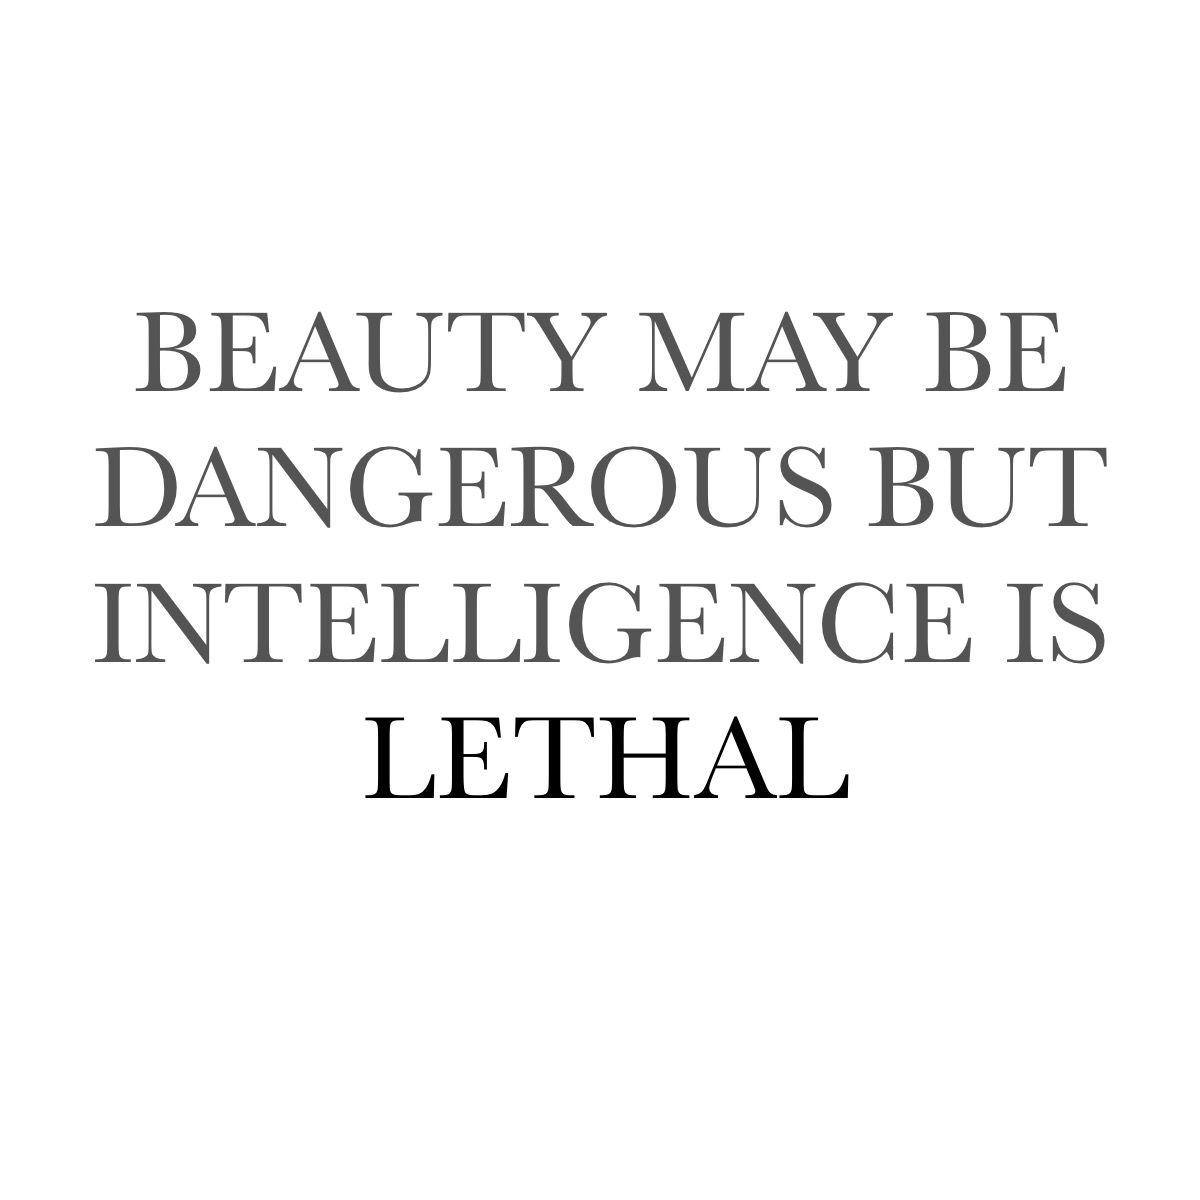 Aesthetic Quotes: Pinterest // @LoSchussler